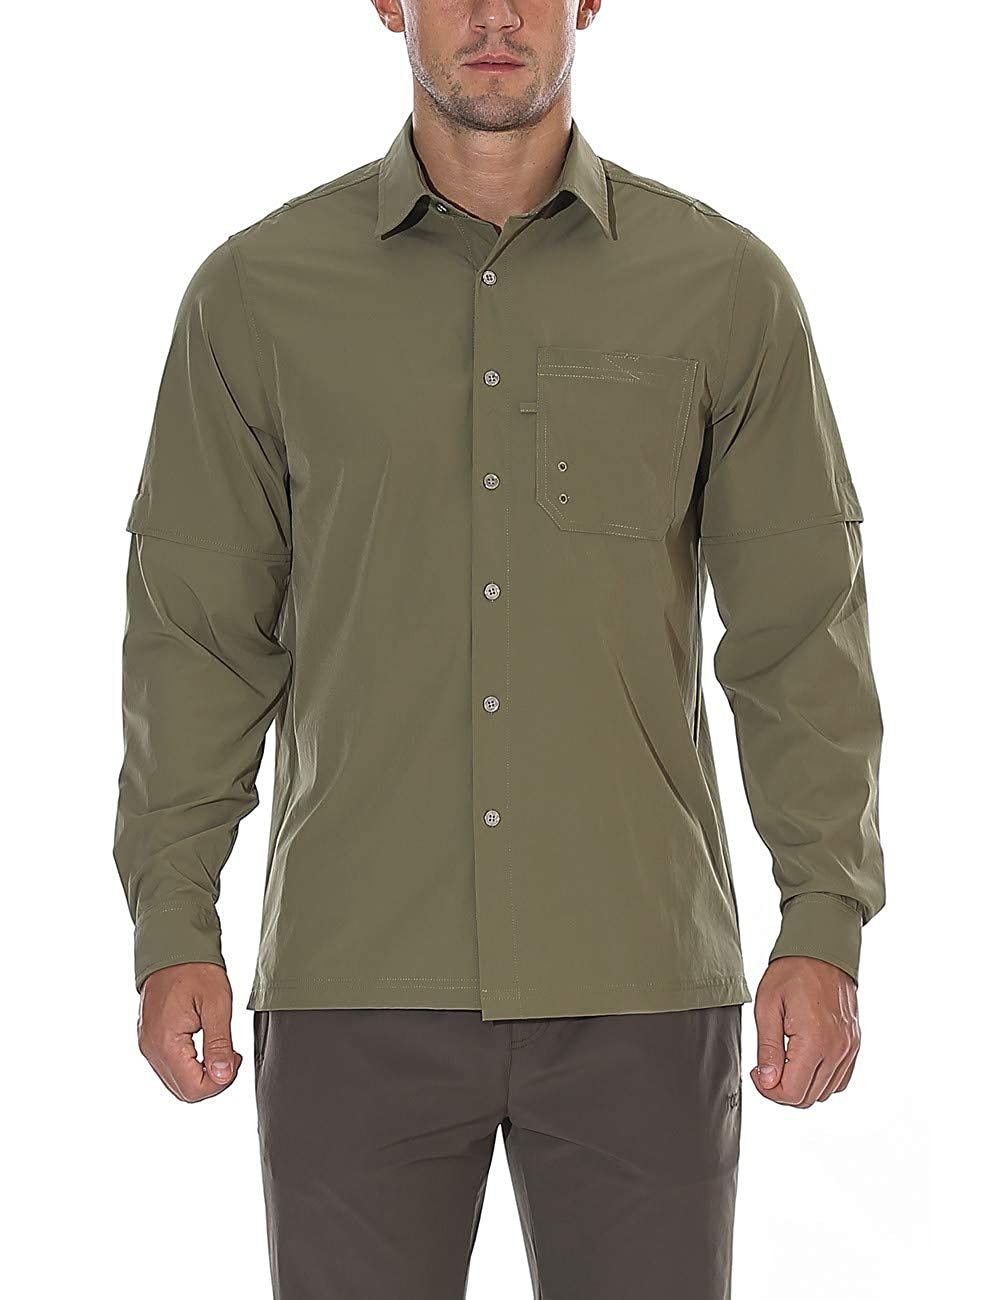 unitop Mens Hiking Shirt Roll-Up Long Sleeve Fishing Shirt